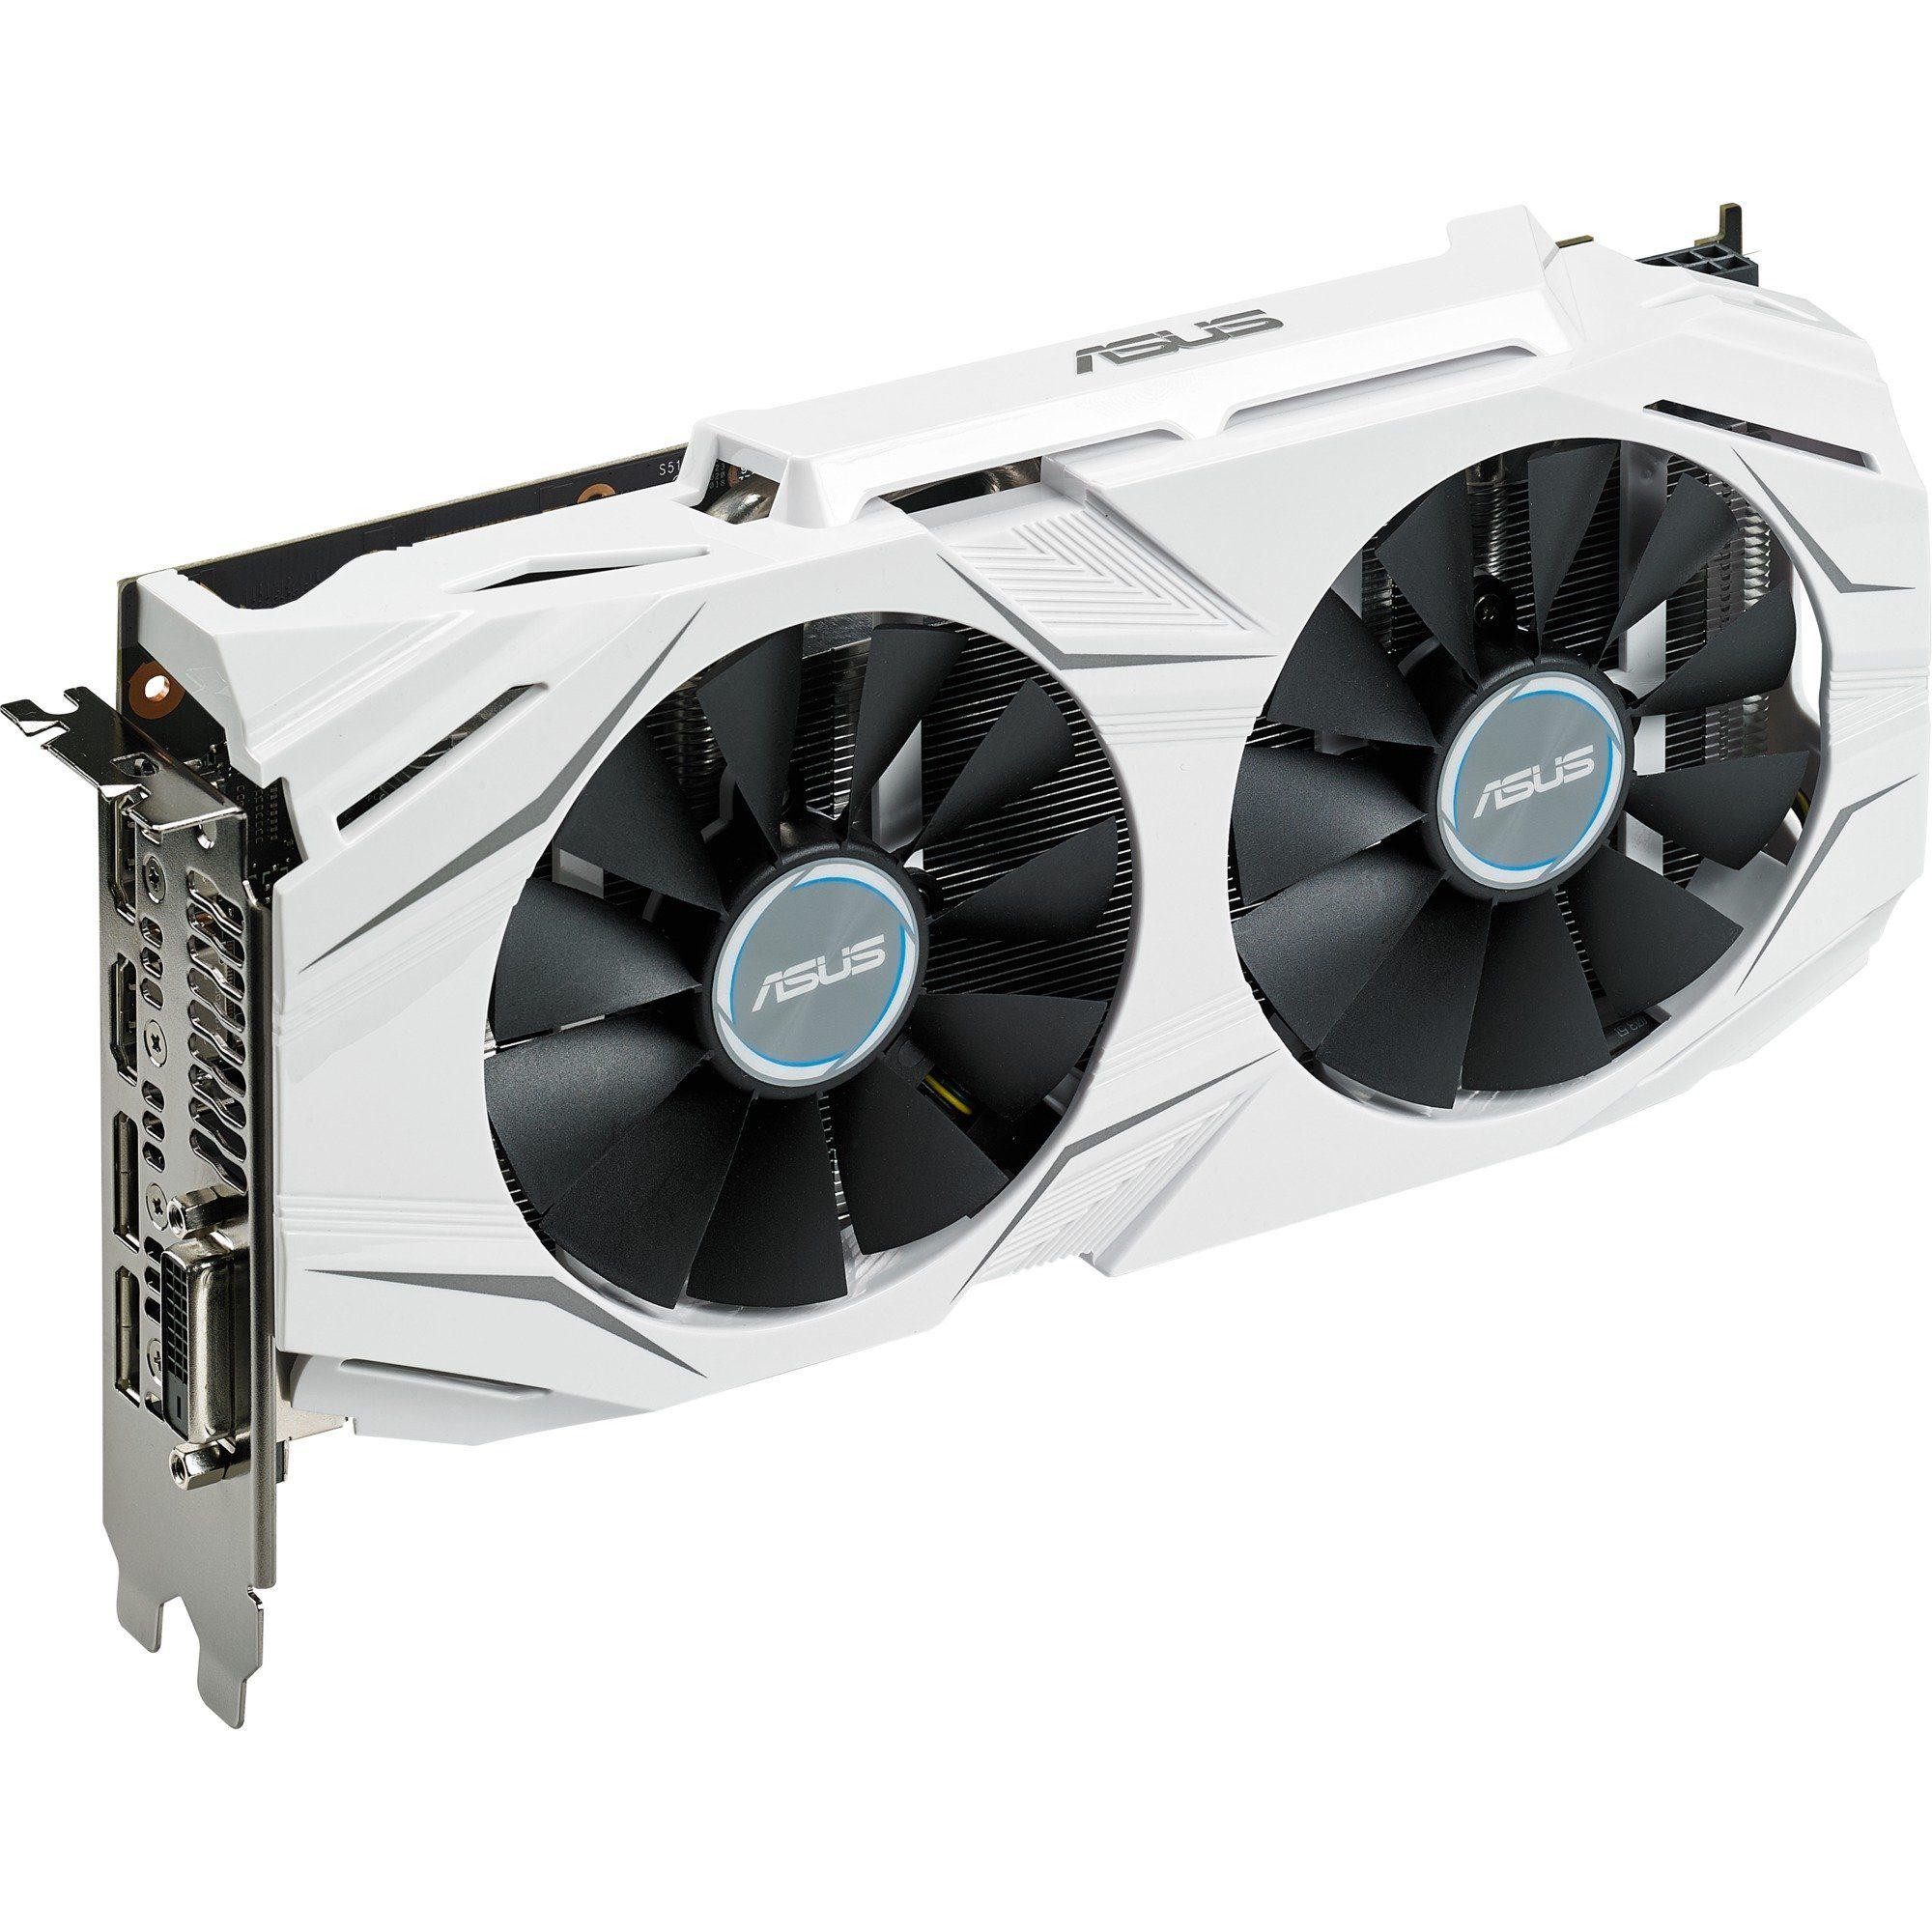 ASUS Grafikkarte »GeForce GTX 1060 DUAL«